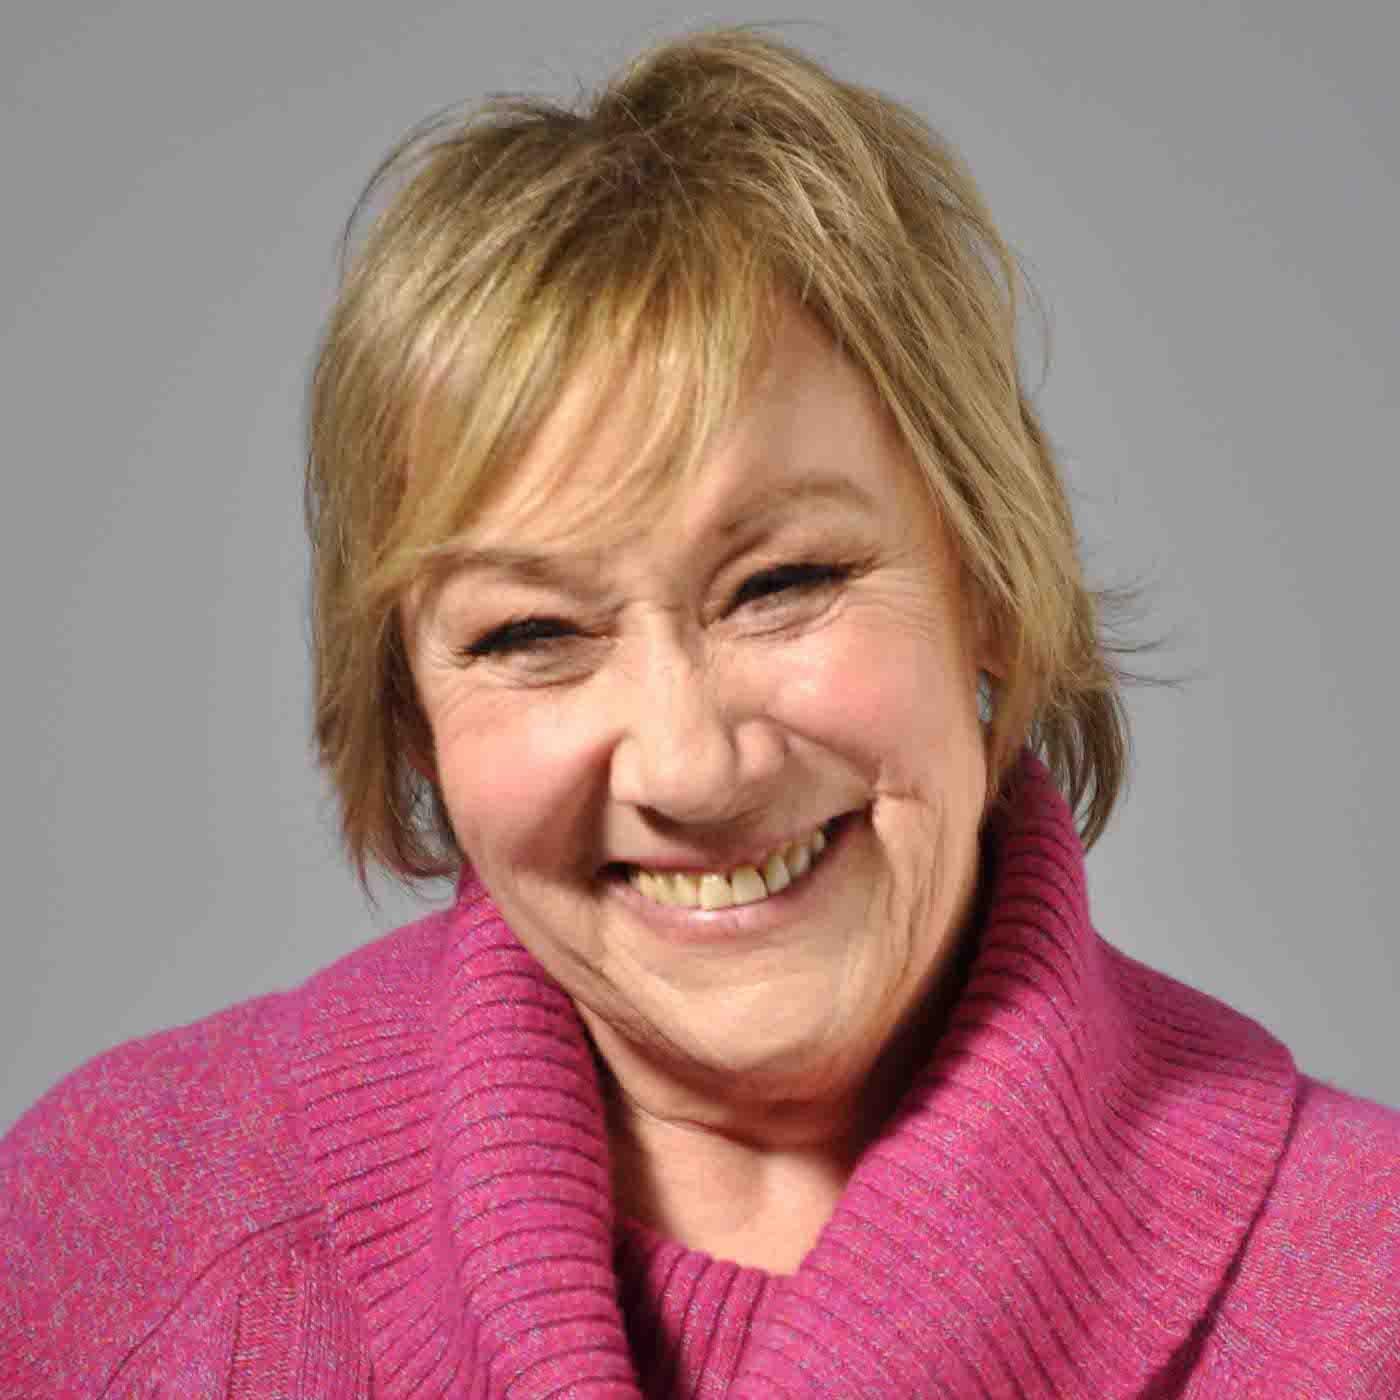 Dr. Patricia Hanratty